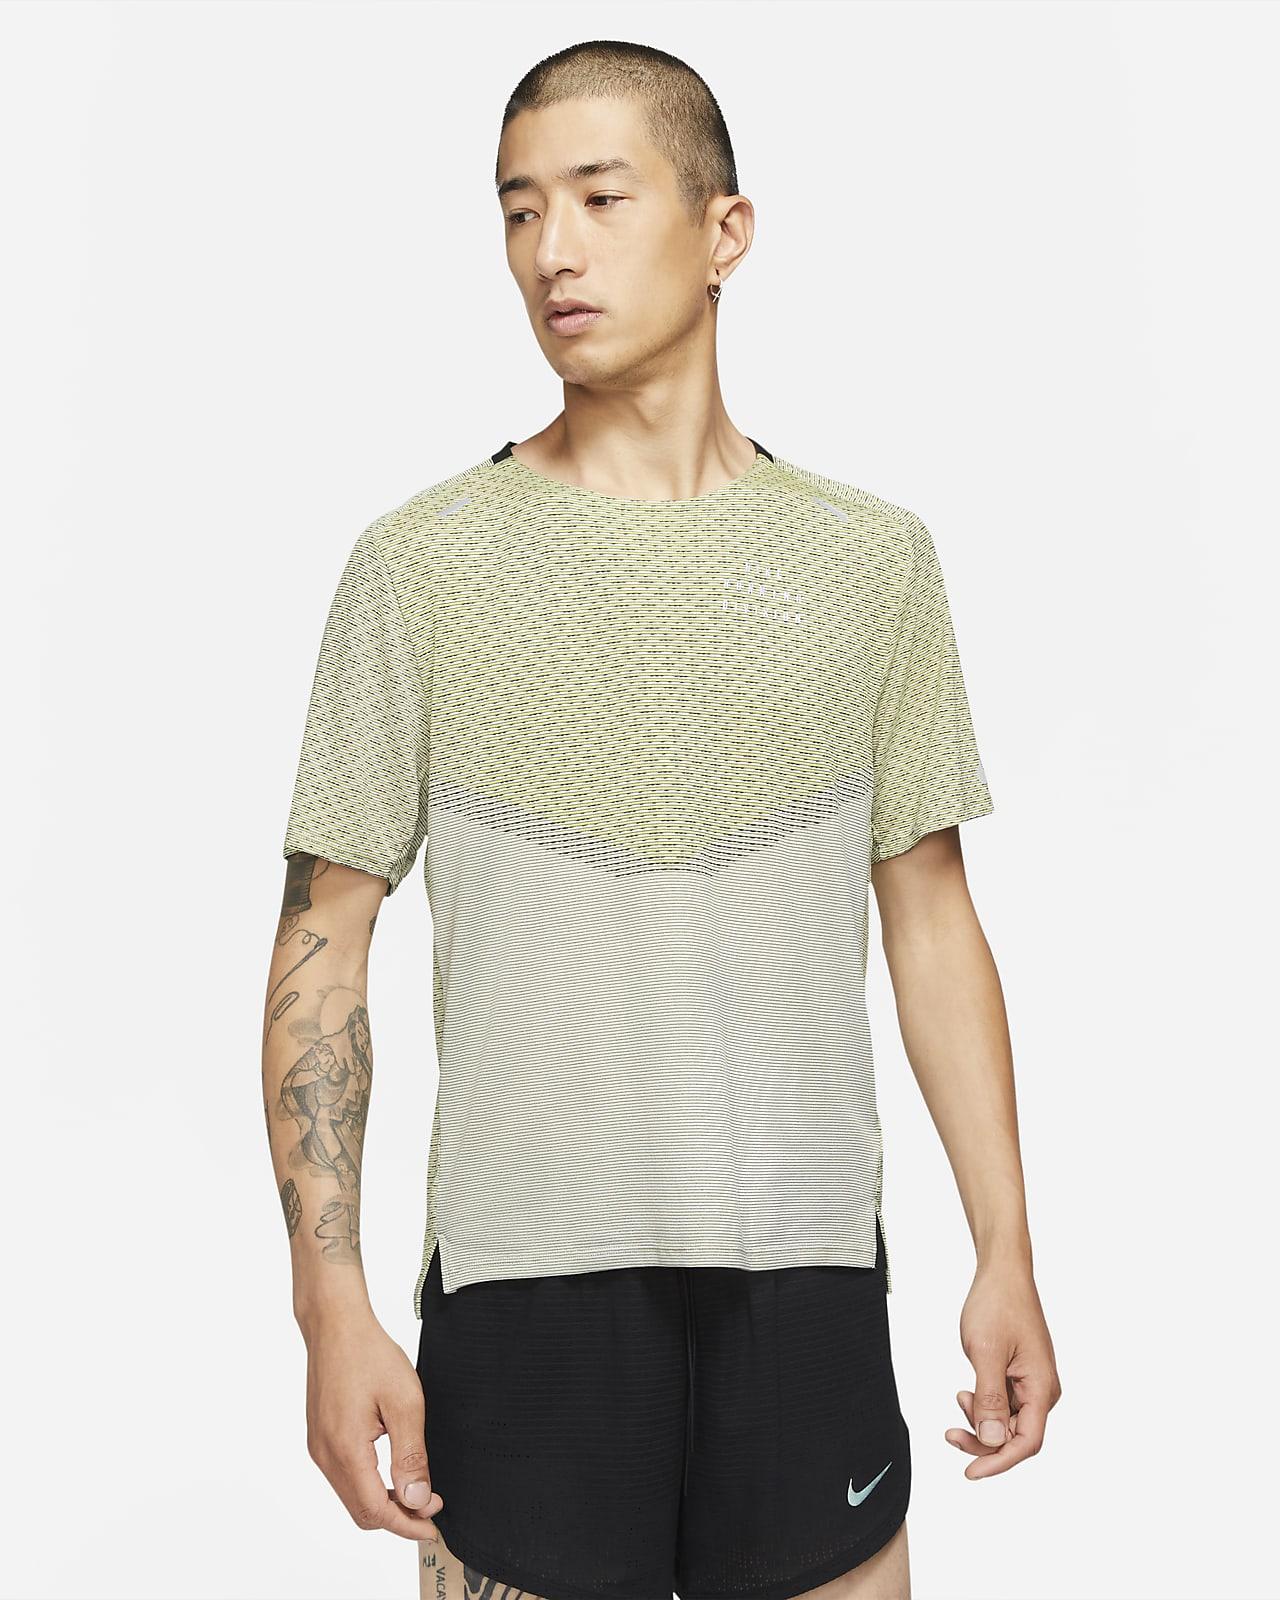 Nike Dri-FIT ADV Run Division TechKnit Men's Short-Sleeve Top